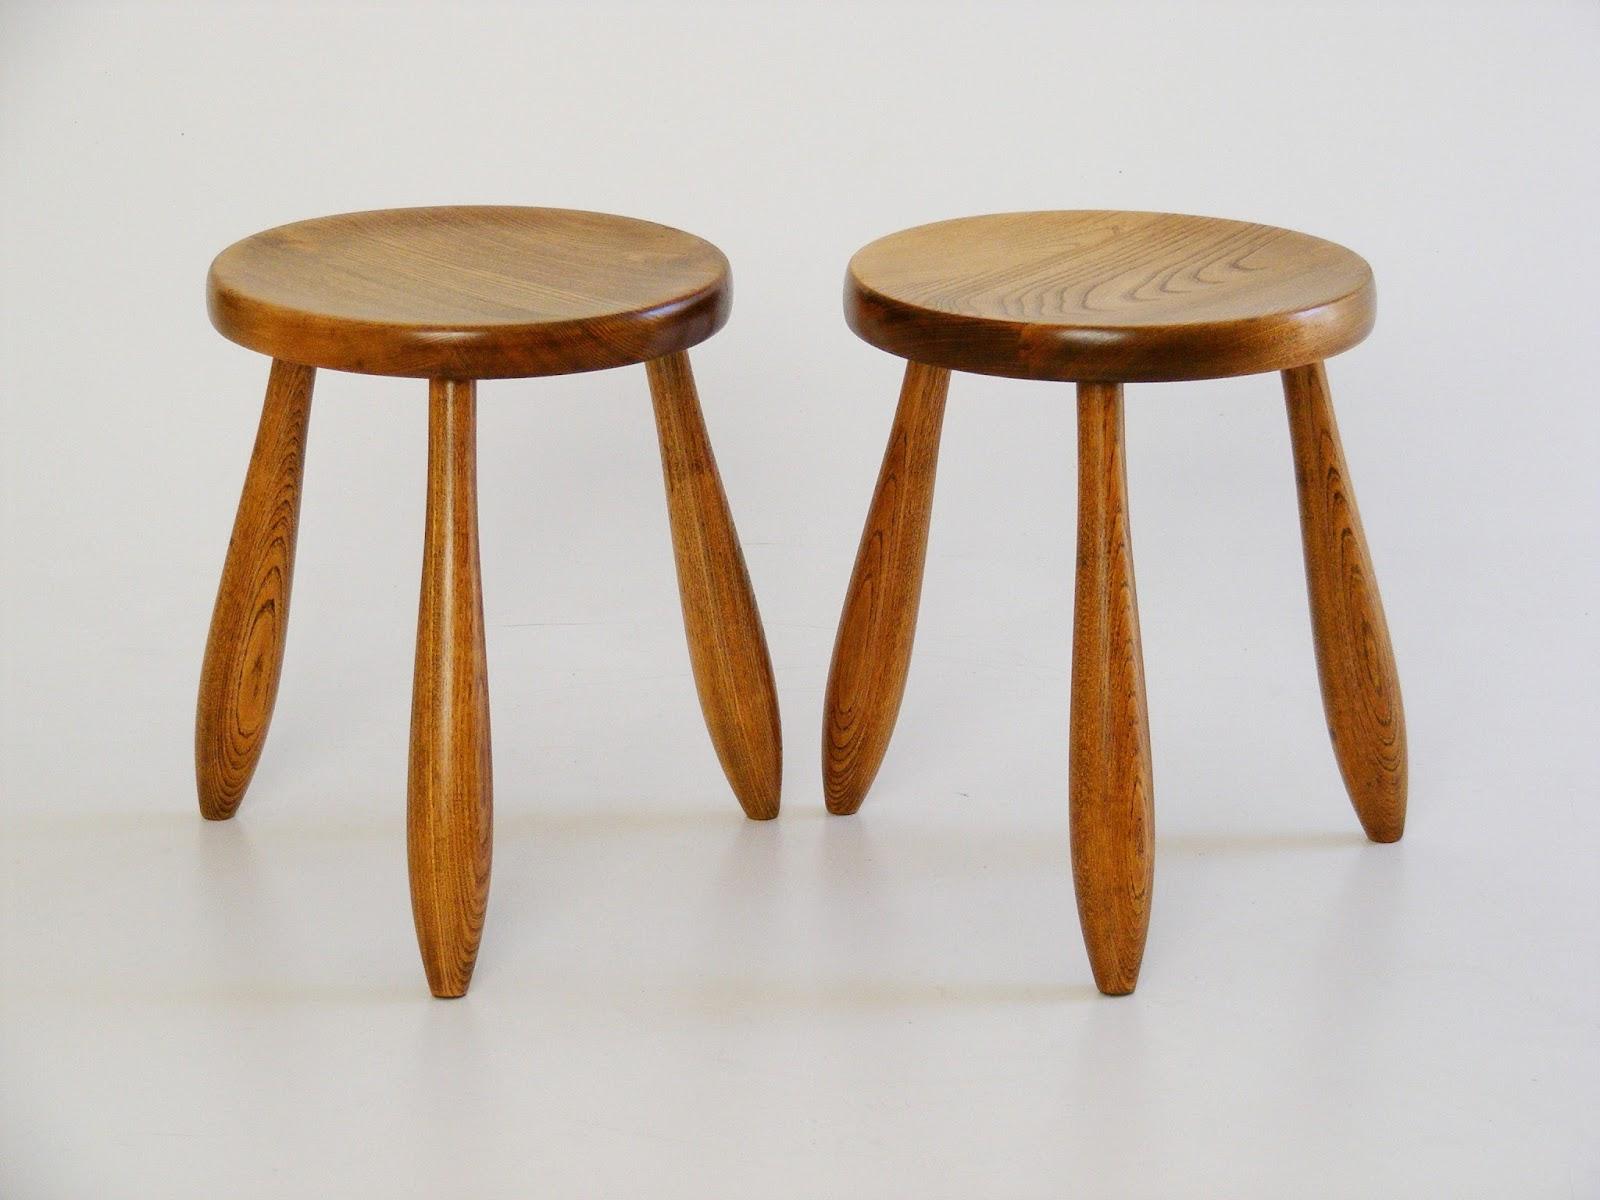 VAMP FURNITURE This weeks new vintage furniture stock at  : PIC2B5AVAMPOAK2BMLKMAID2BSTOOLS08042016 from vampfurniture.blogspot.com size 1600 x 1200 jpeg 193kB